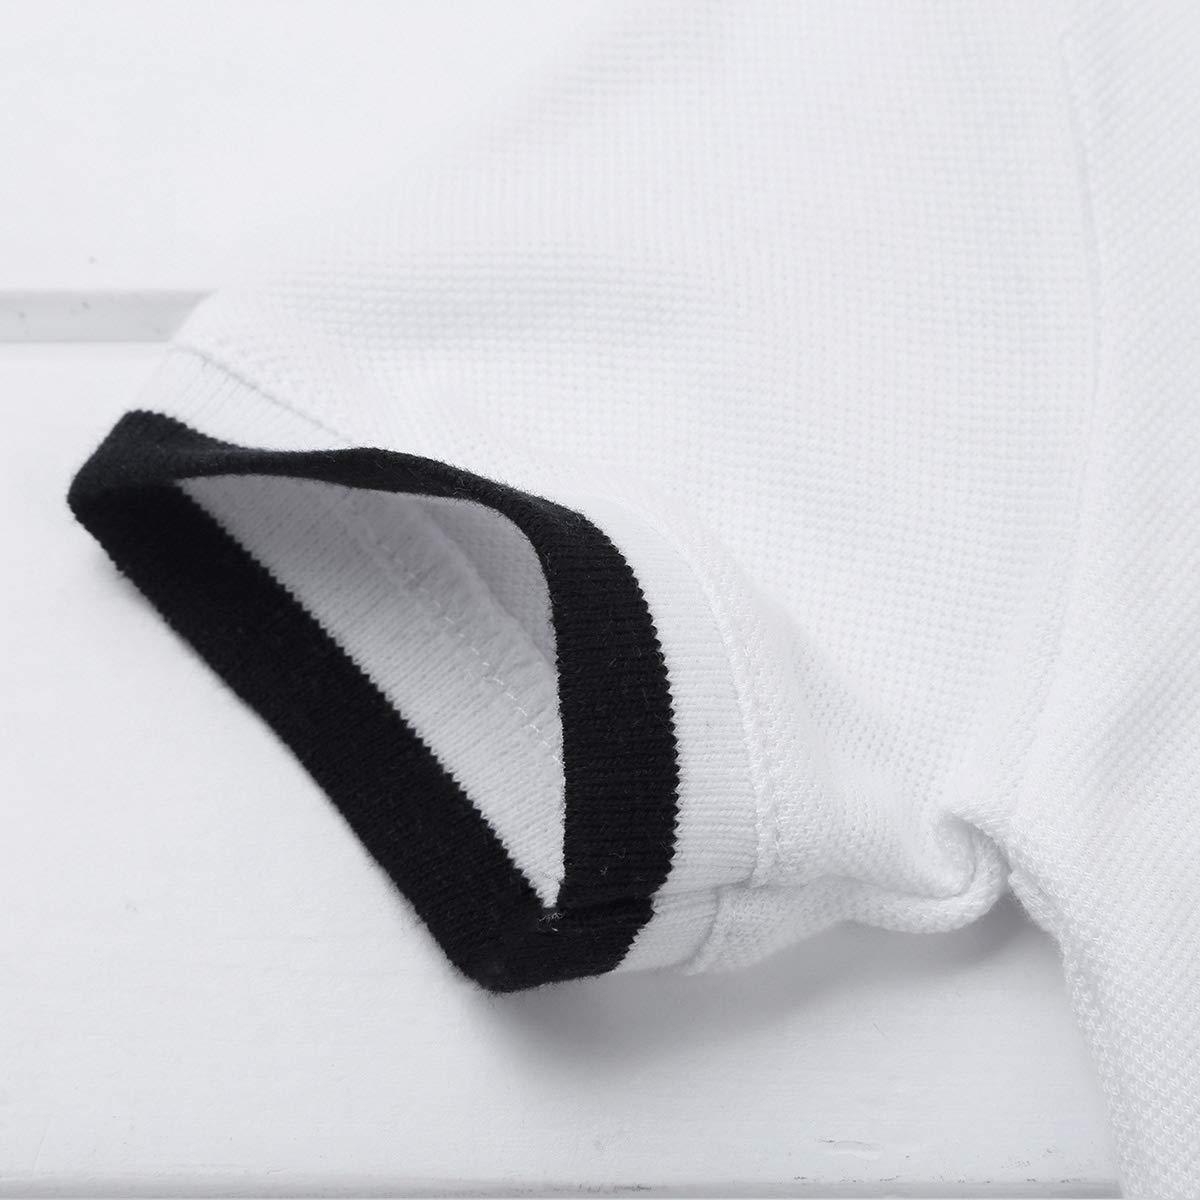 Freebily Body B/éb/é Gar/çon Filles Top Barboteuse Coton Solide Col Roul/é Shirt Unisexe B/éb/é Chemise Bodysuit Blanc Bleu Marin Grenouill/ères 6-24 Mois